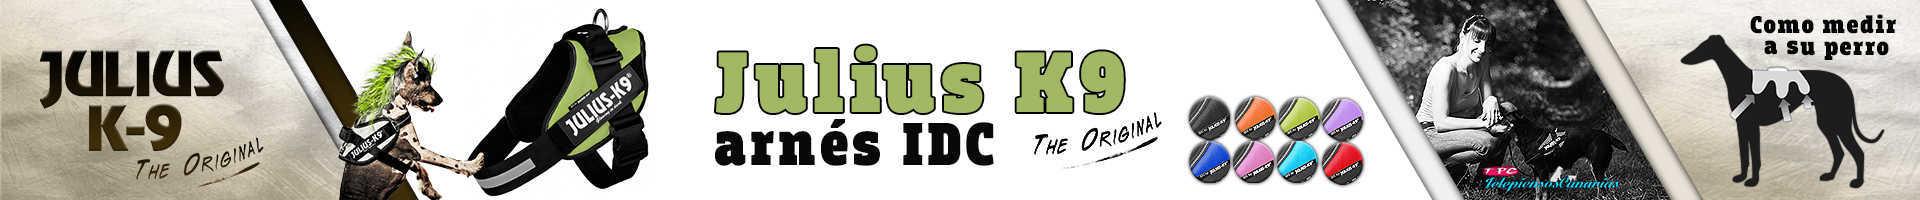 Julius-K9 arnés idc color verde, alta visibilidad